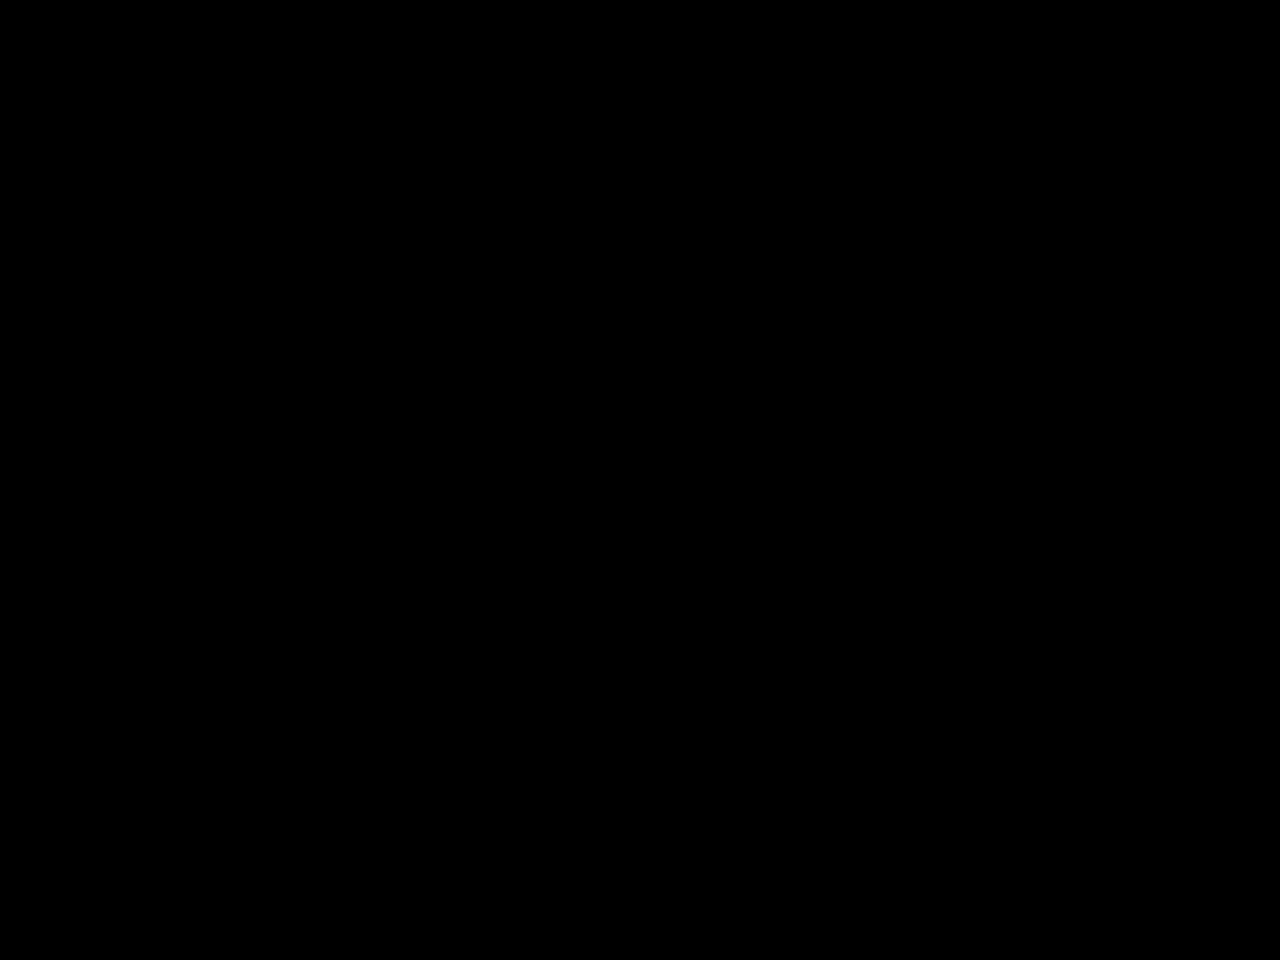 Nx-250